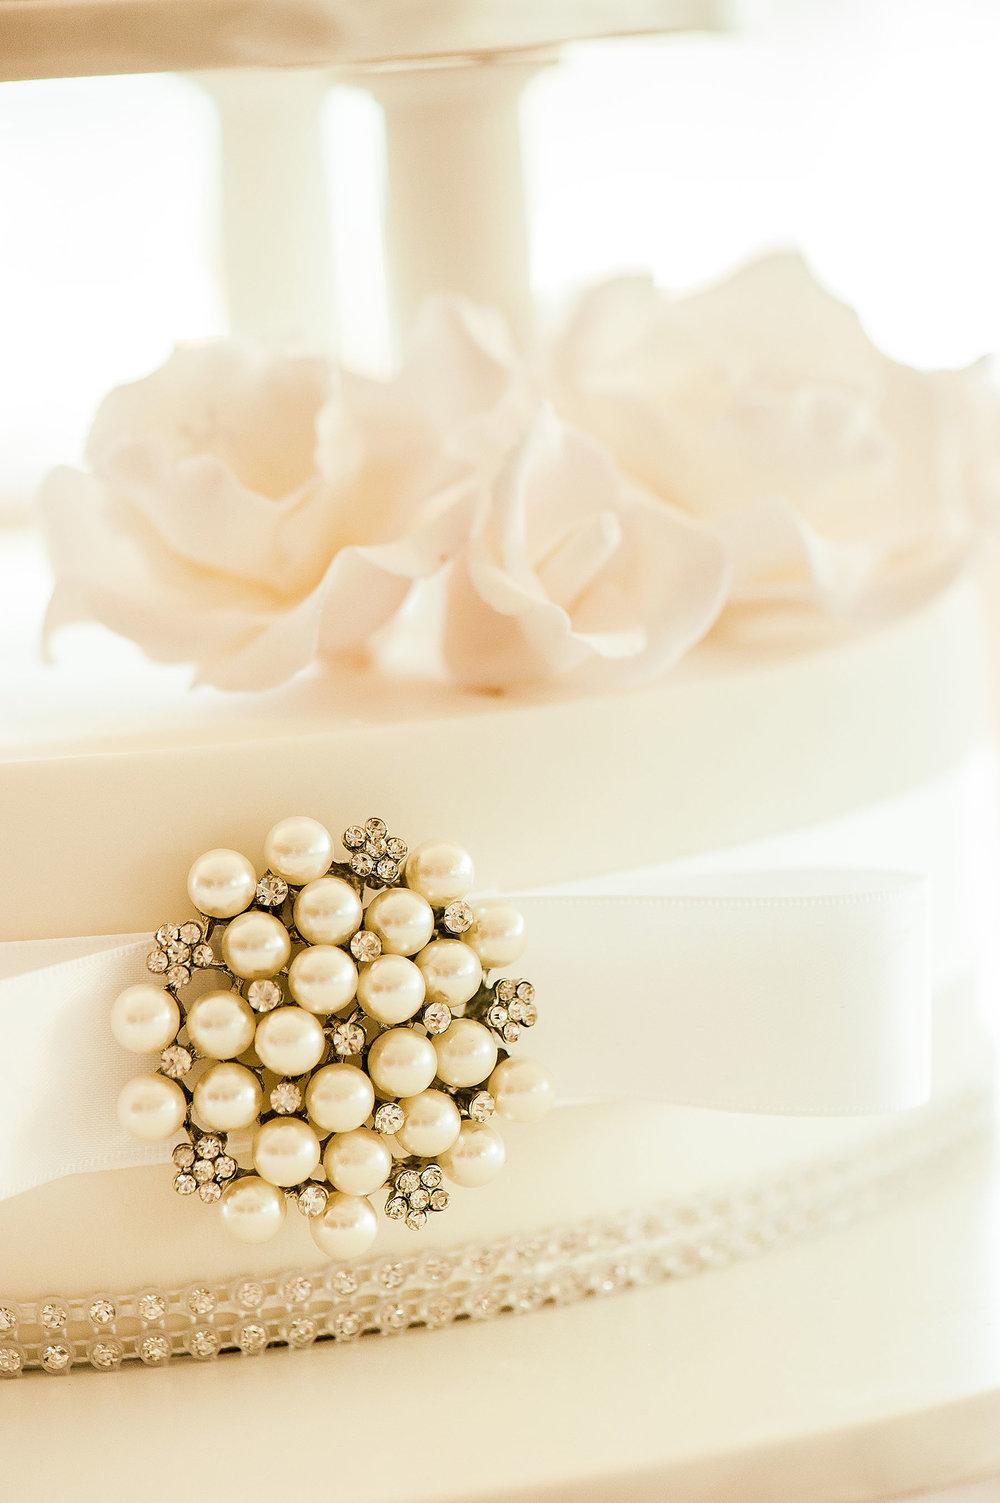 Marryme_wedding_photography_dorrigo_bellingen_photographer_23.jpg